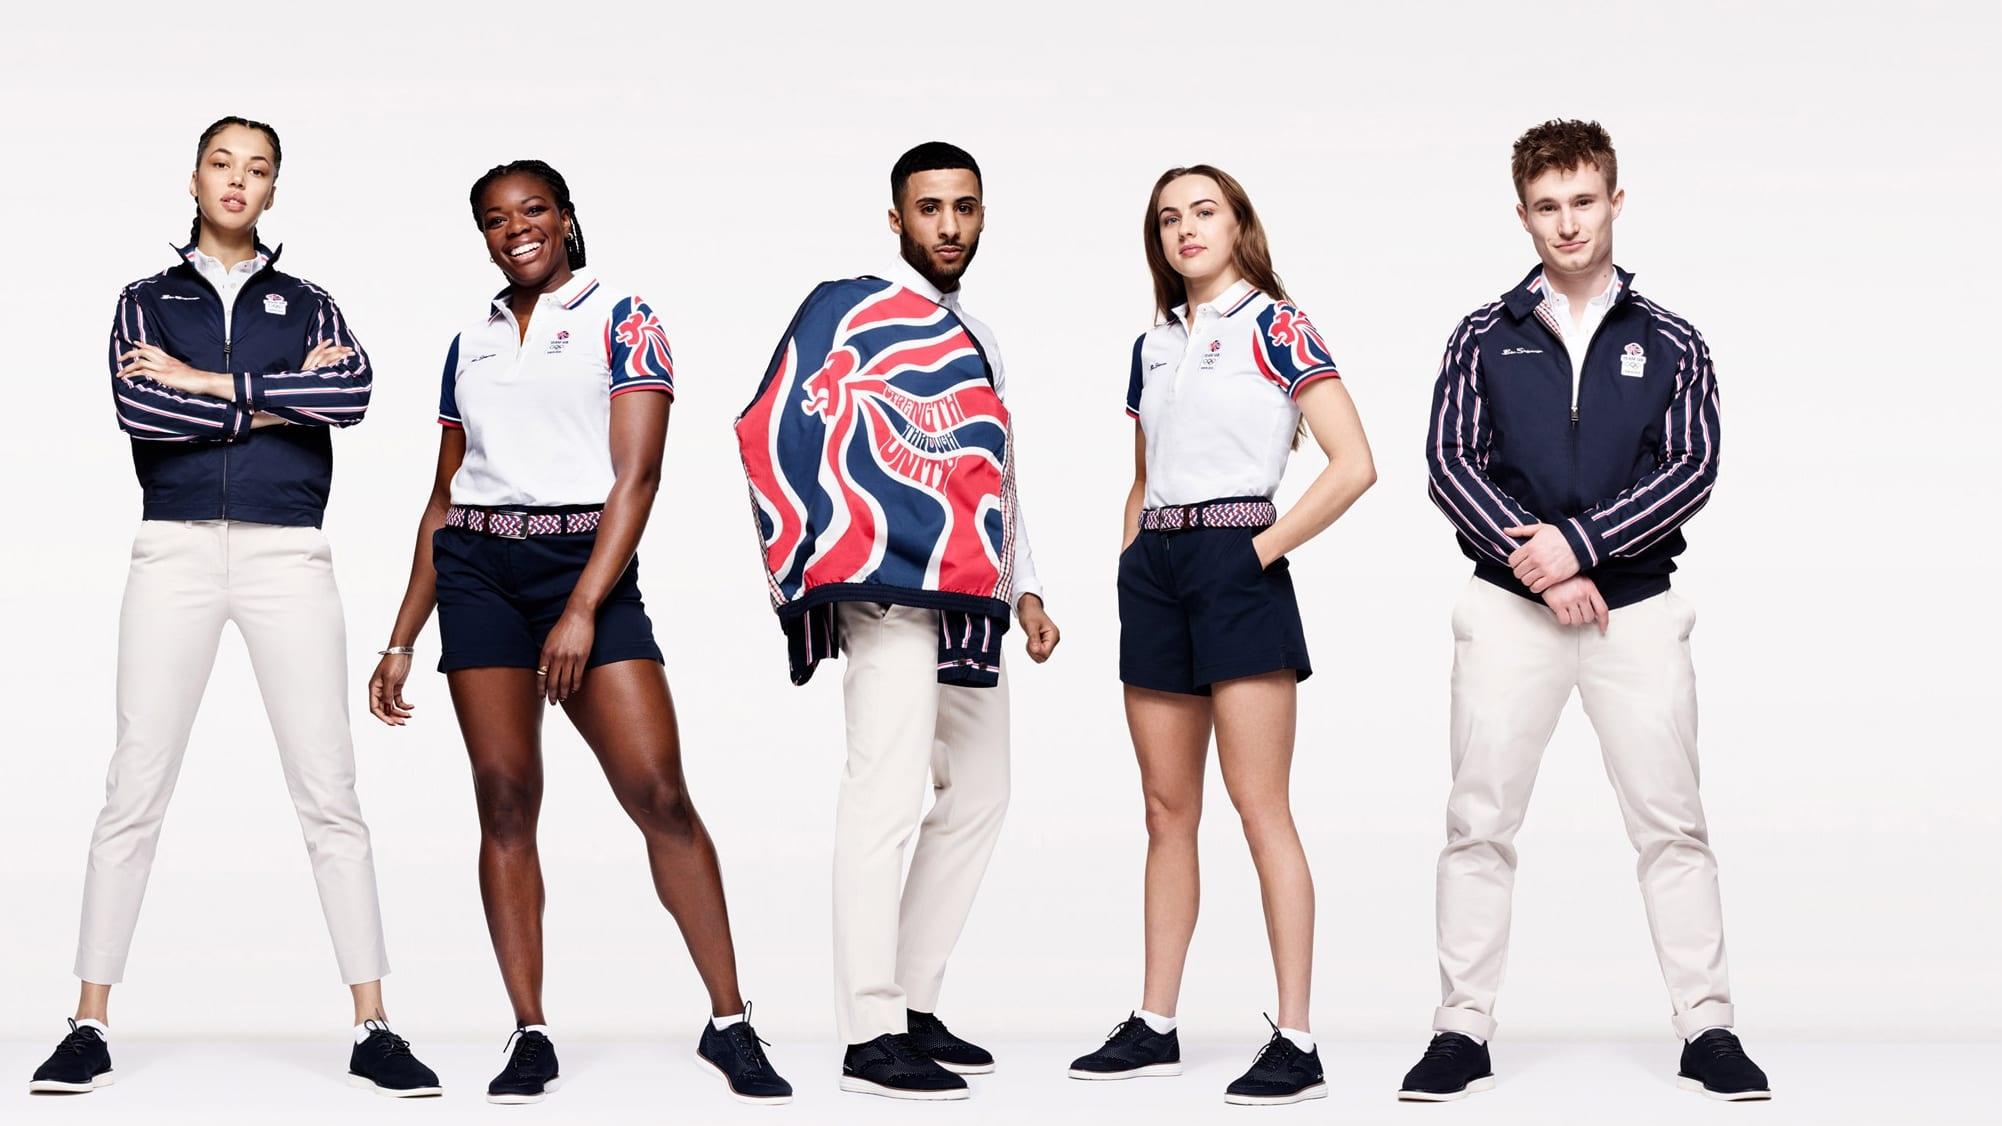 Uniformes olímpicos